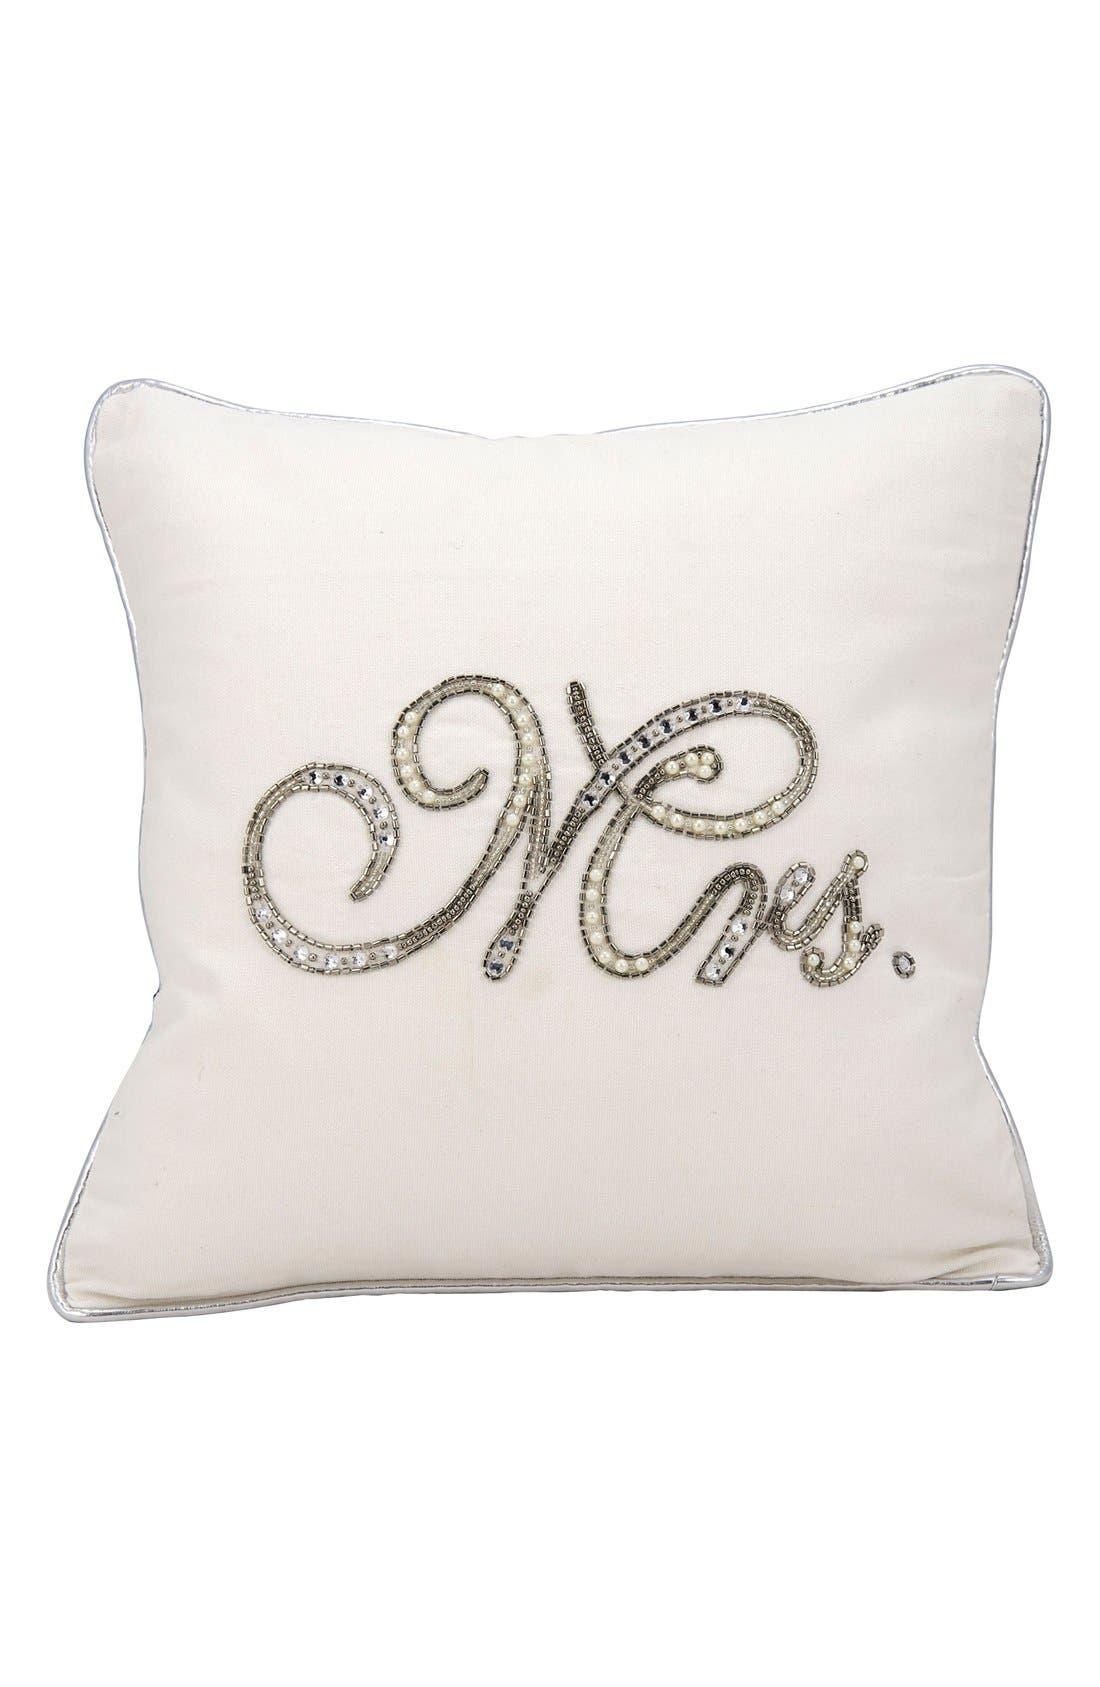 Alternate Image 1 Selected - Mina Victory Embellished Wedding Pillow